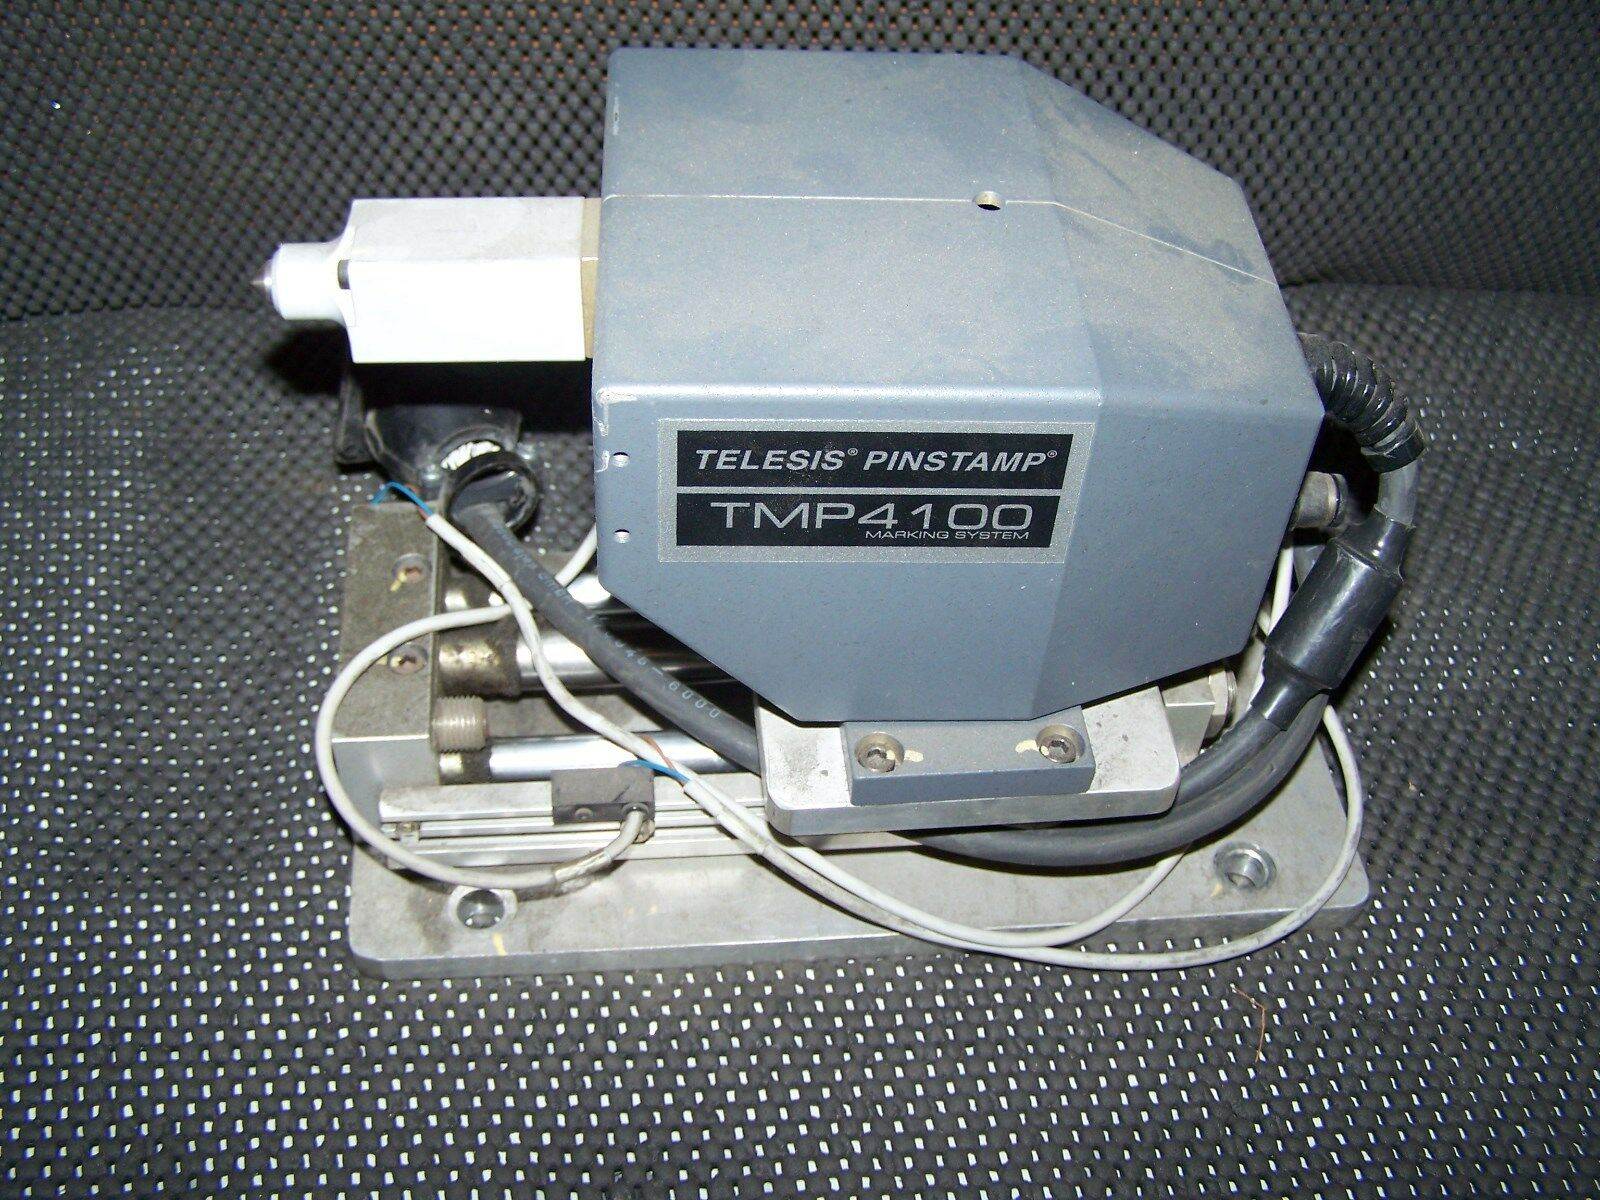 TELESIS PINSTAMP TMP1400 MARKING SYSTEM W/ HEAD